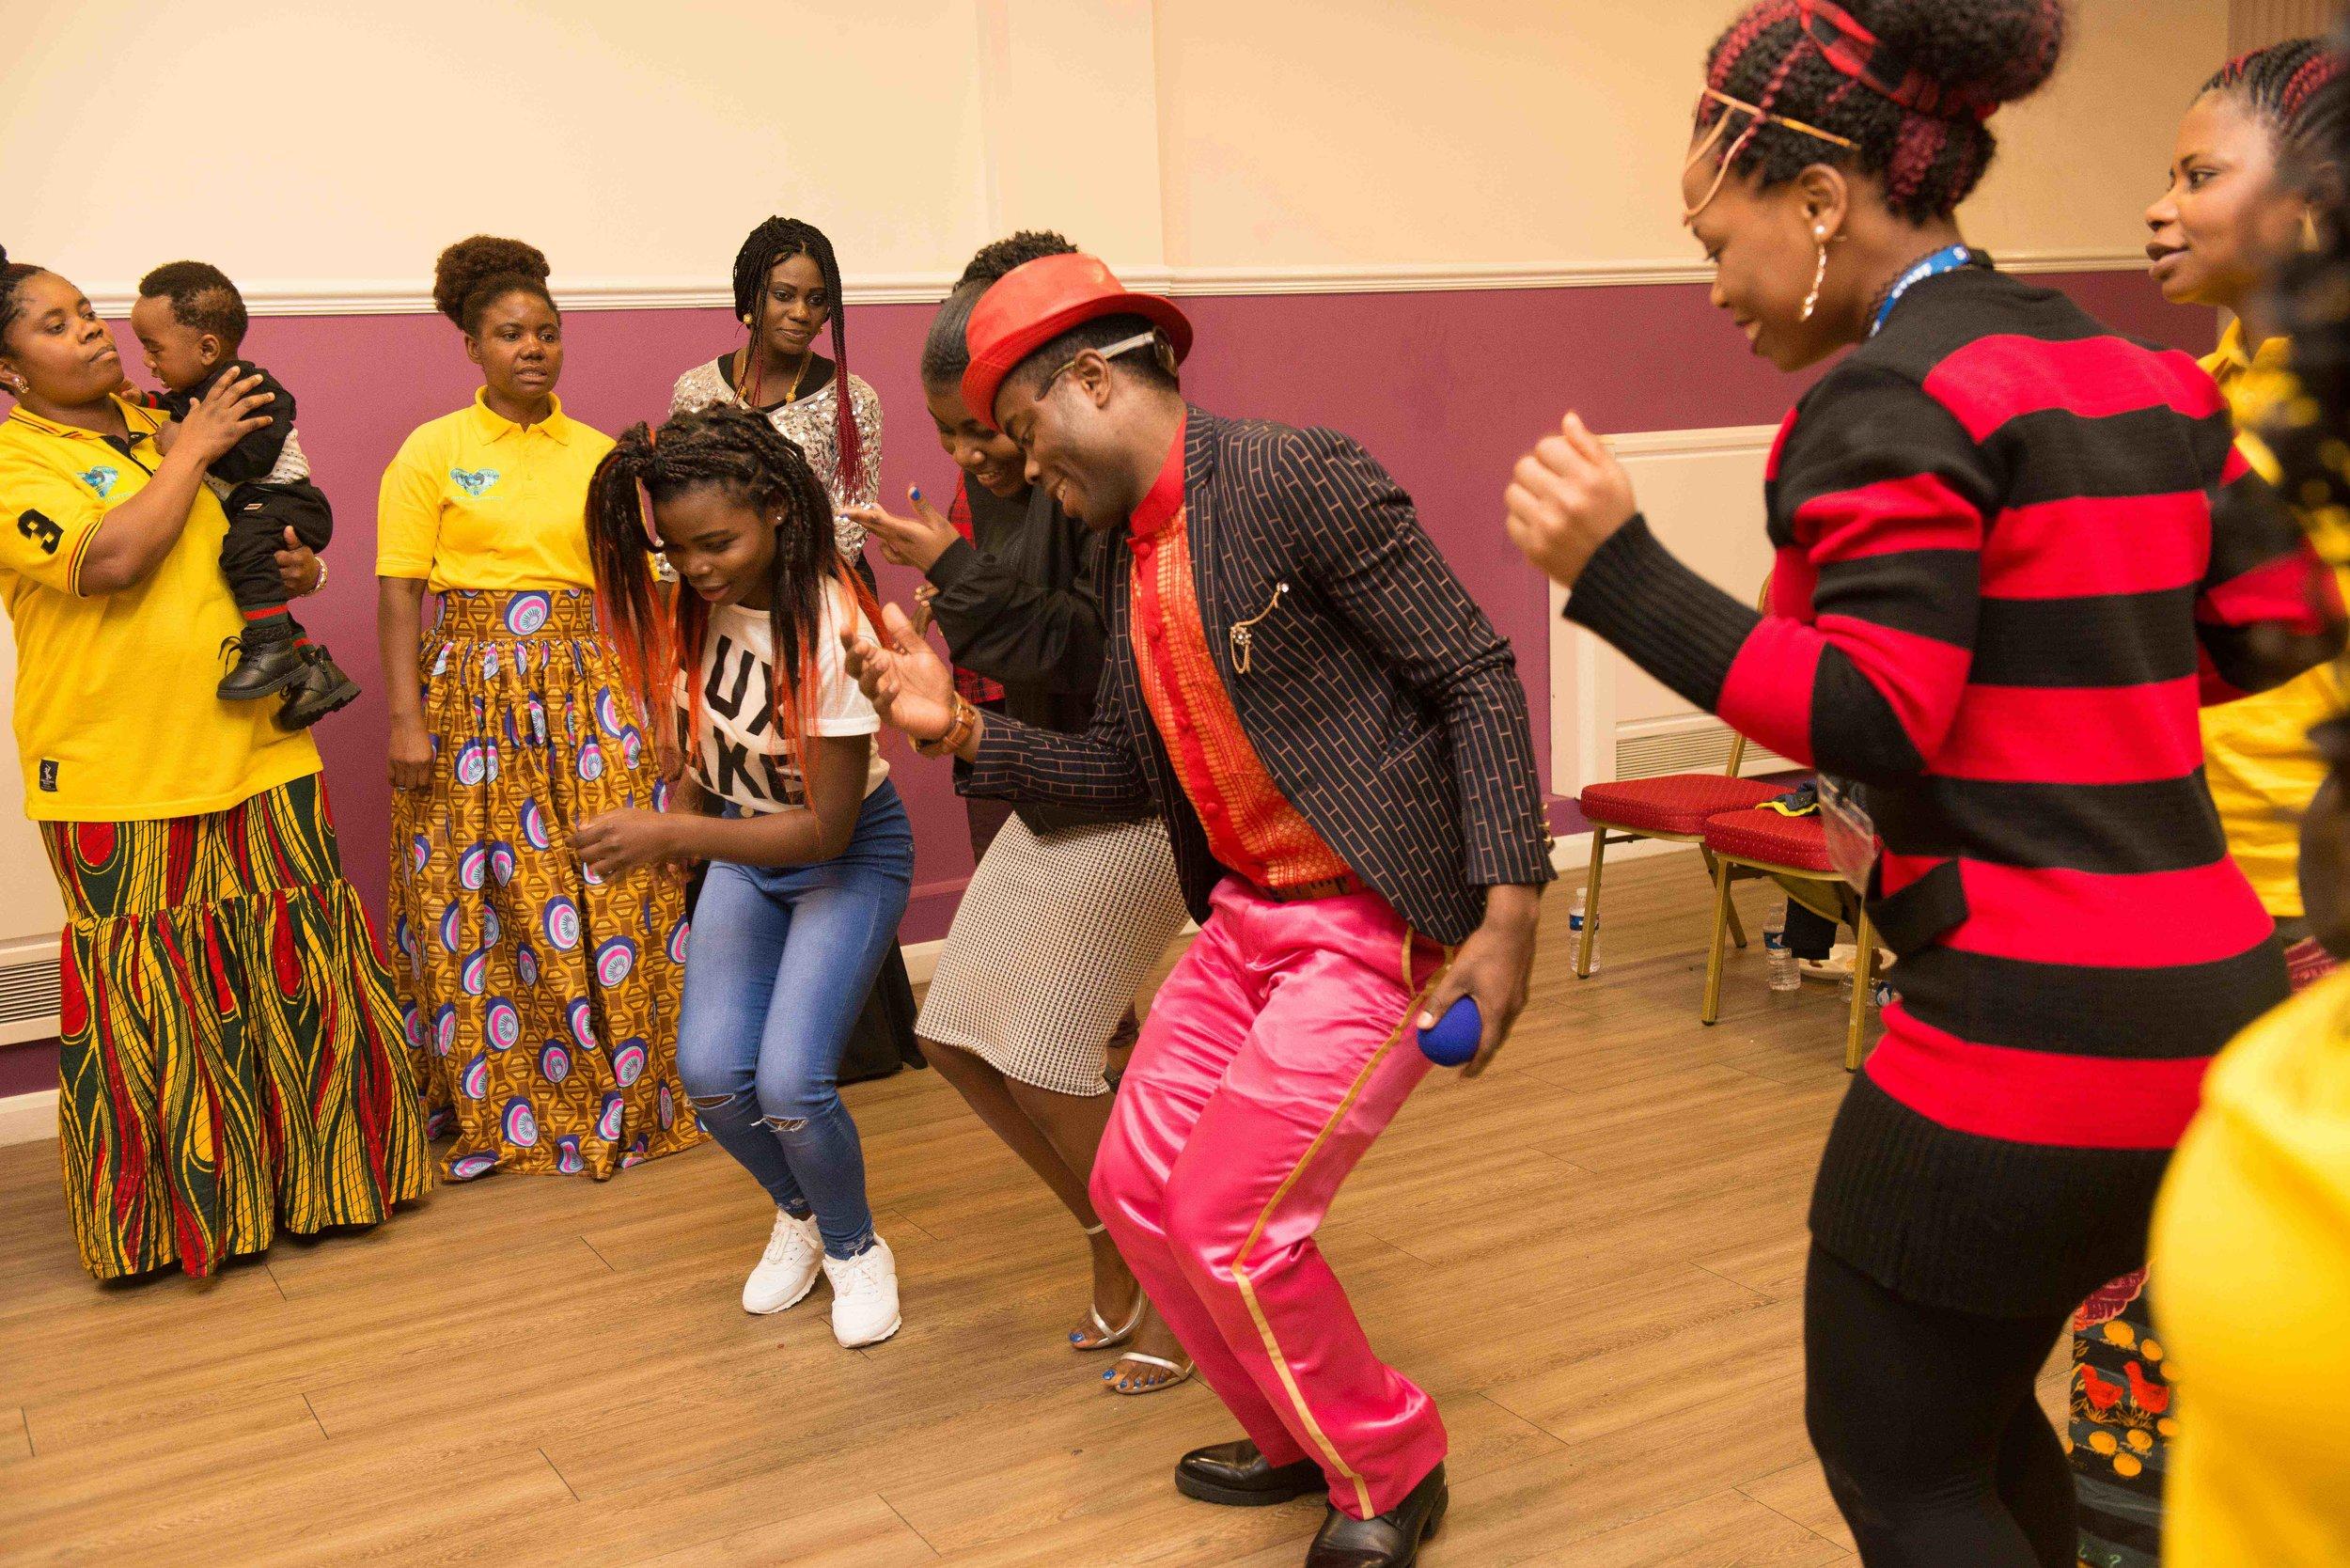 Upendo Community Event - 18th November 2017, Mayfield Centre, Bradford